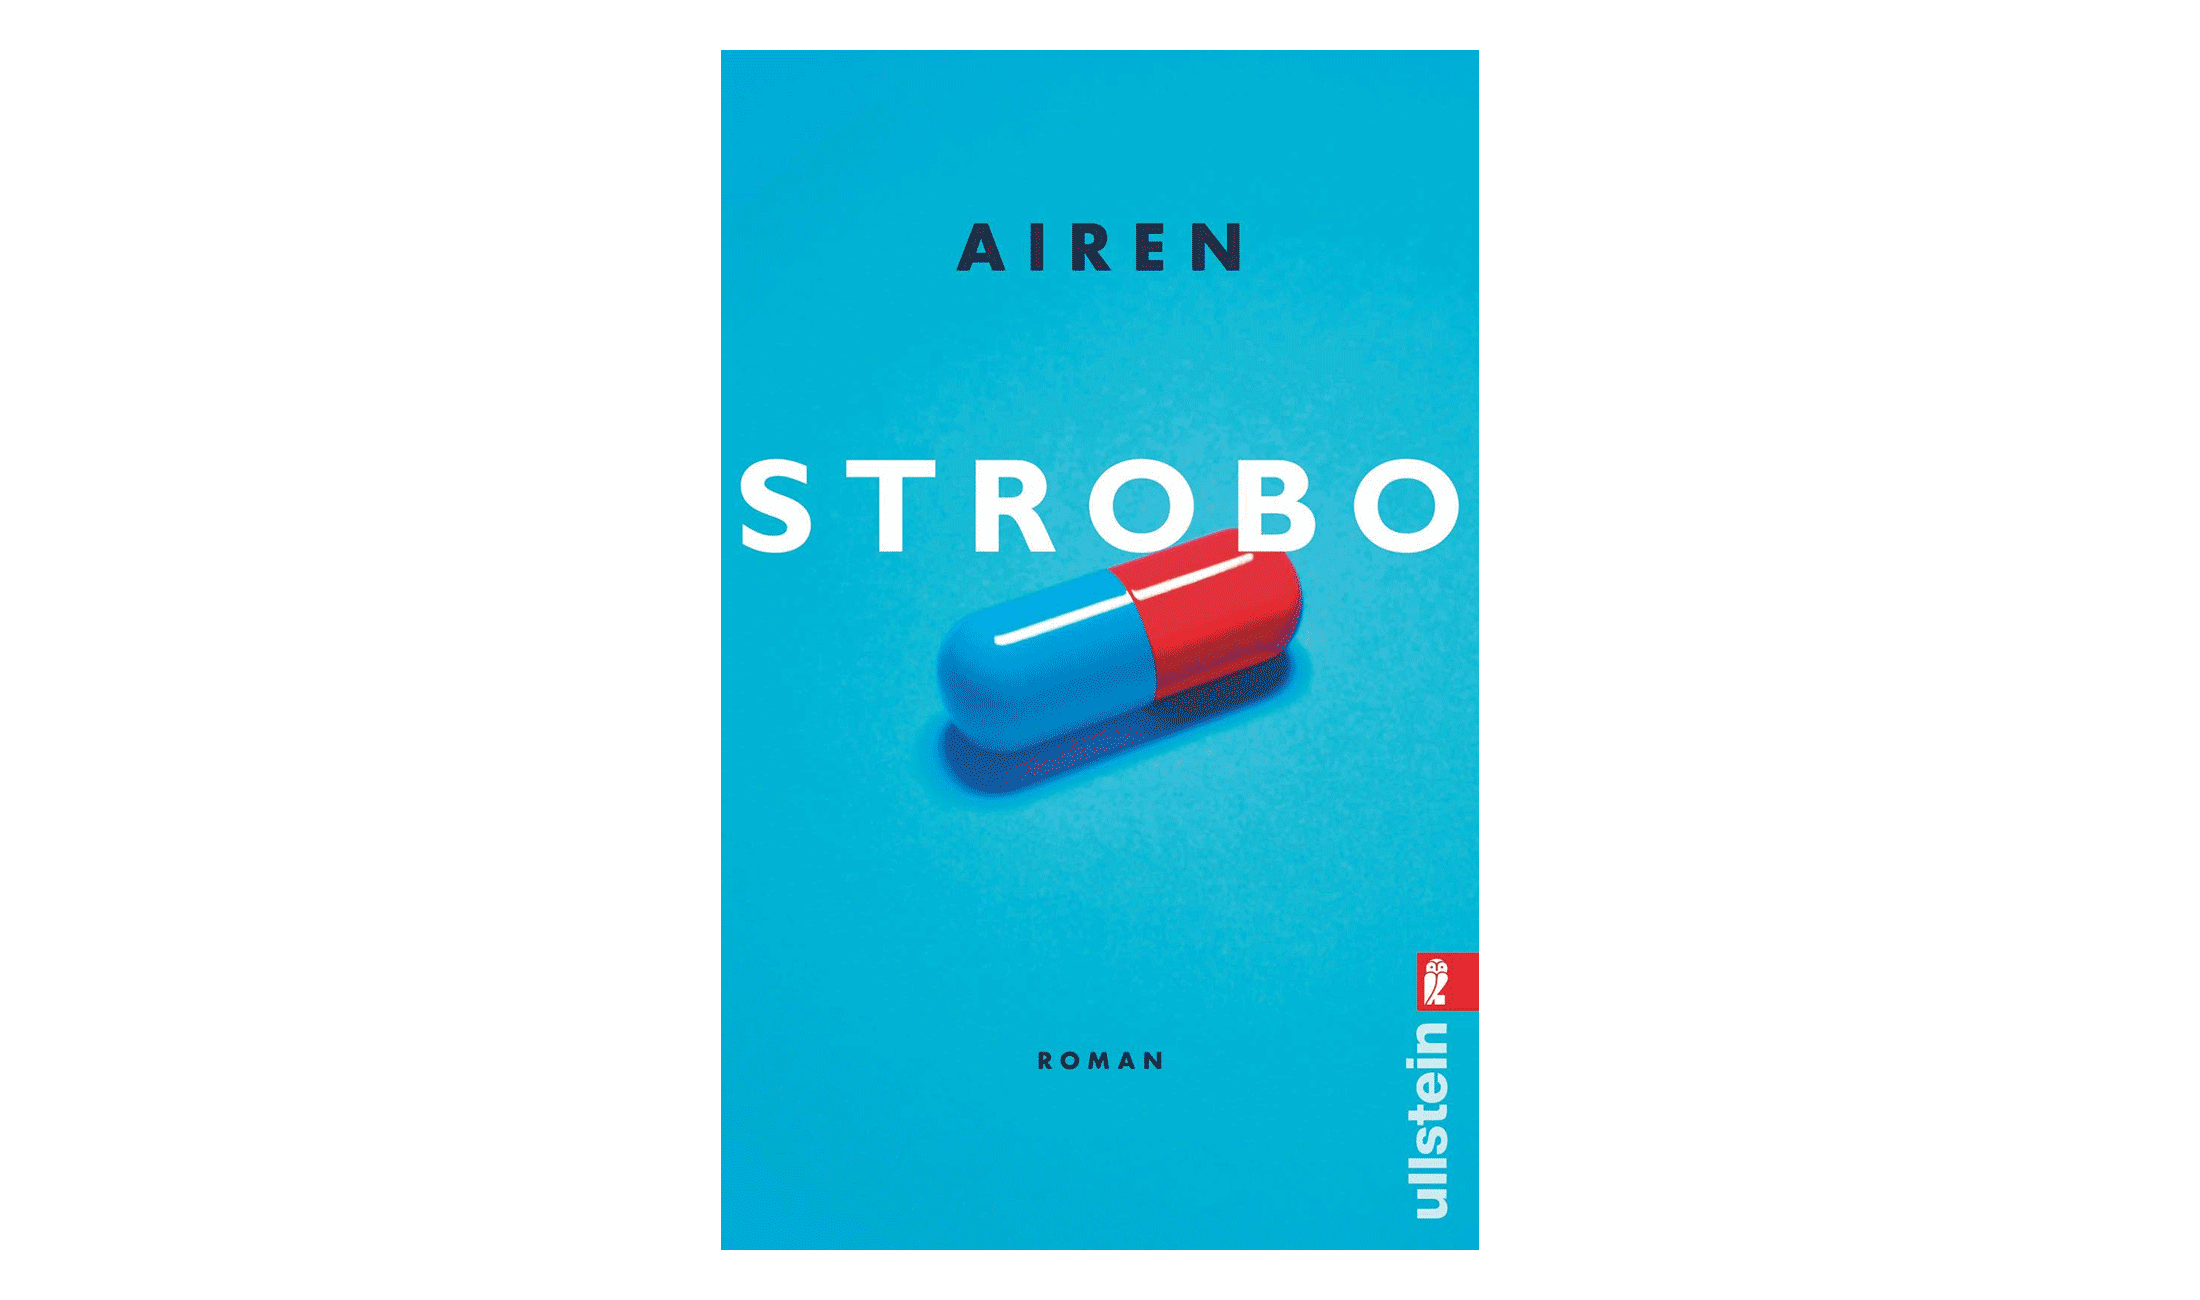 Techno Roman: Strobo (2009) von Airen.